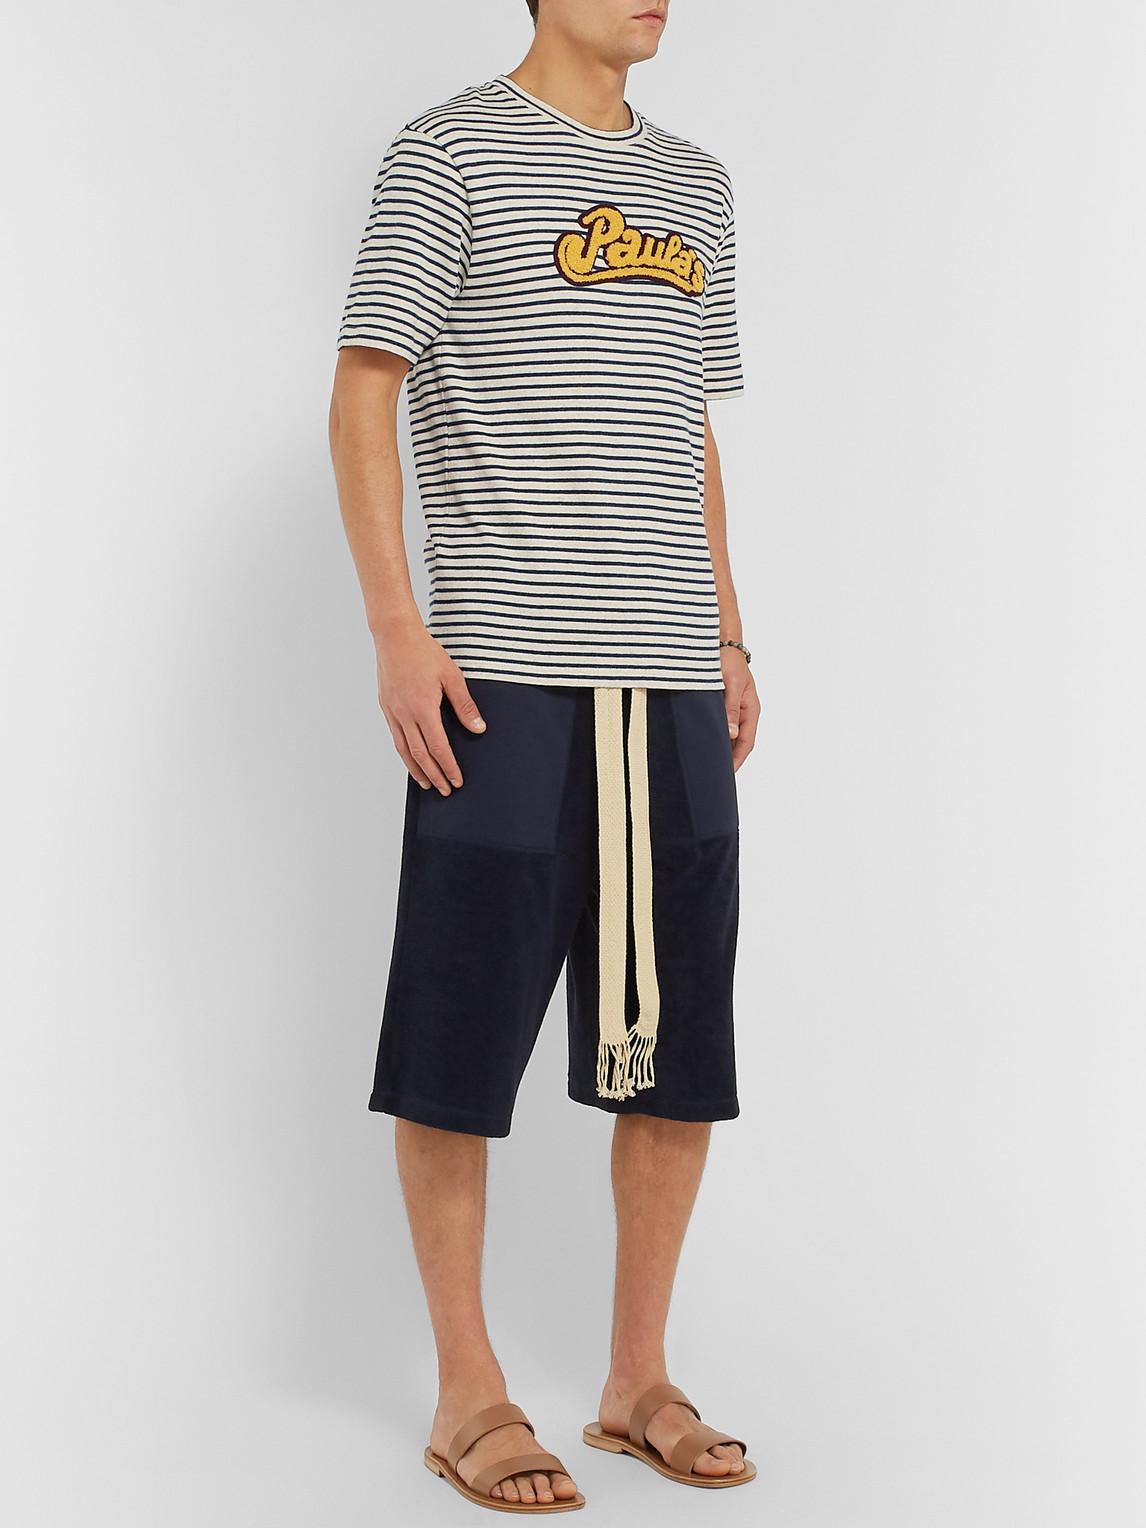 Loewe T-shirts PAULA'S IBIZA LOGO-APPLIQUÉD STRIPED COTTON T-SHIRT